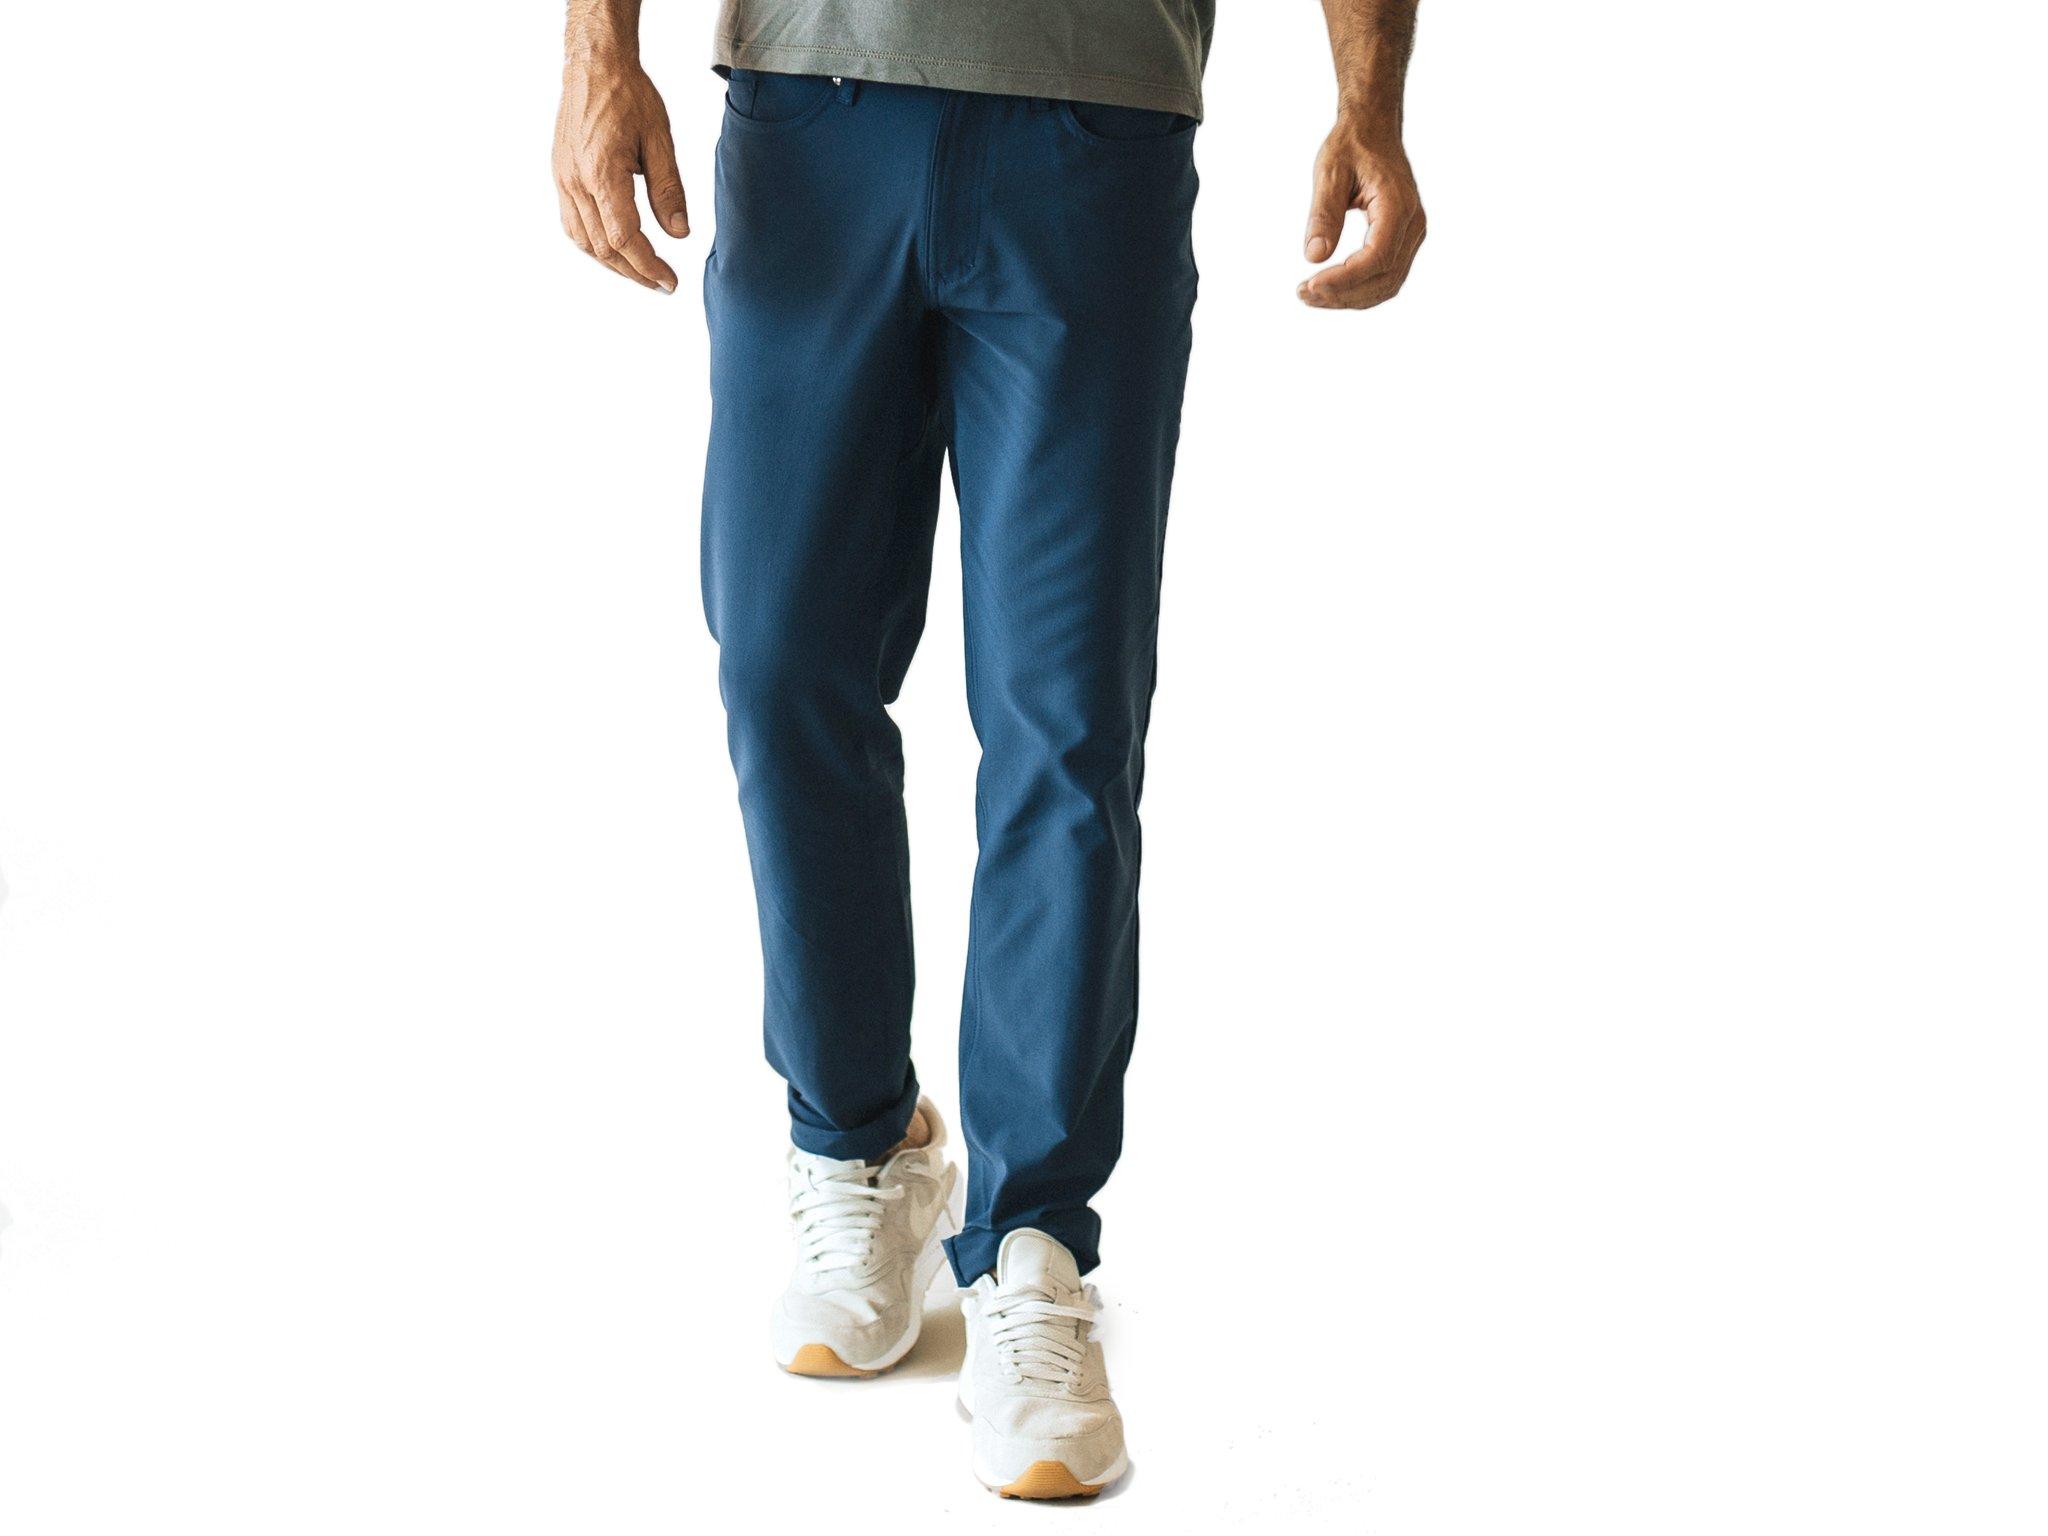 OLIVERS Everyday Performance Passage Pant, Indigo Blue, 34 inch Waist